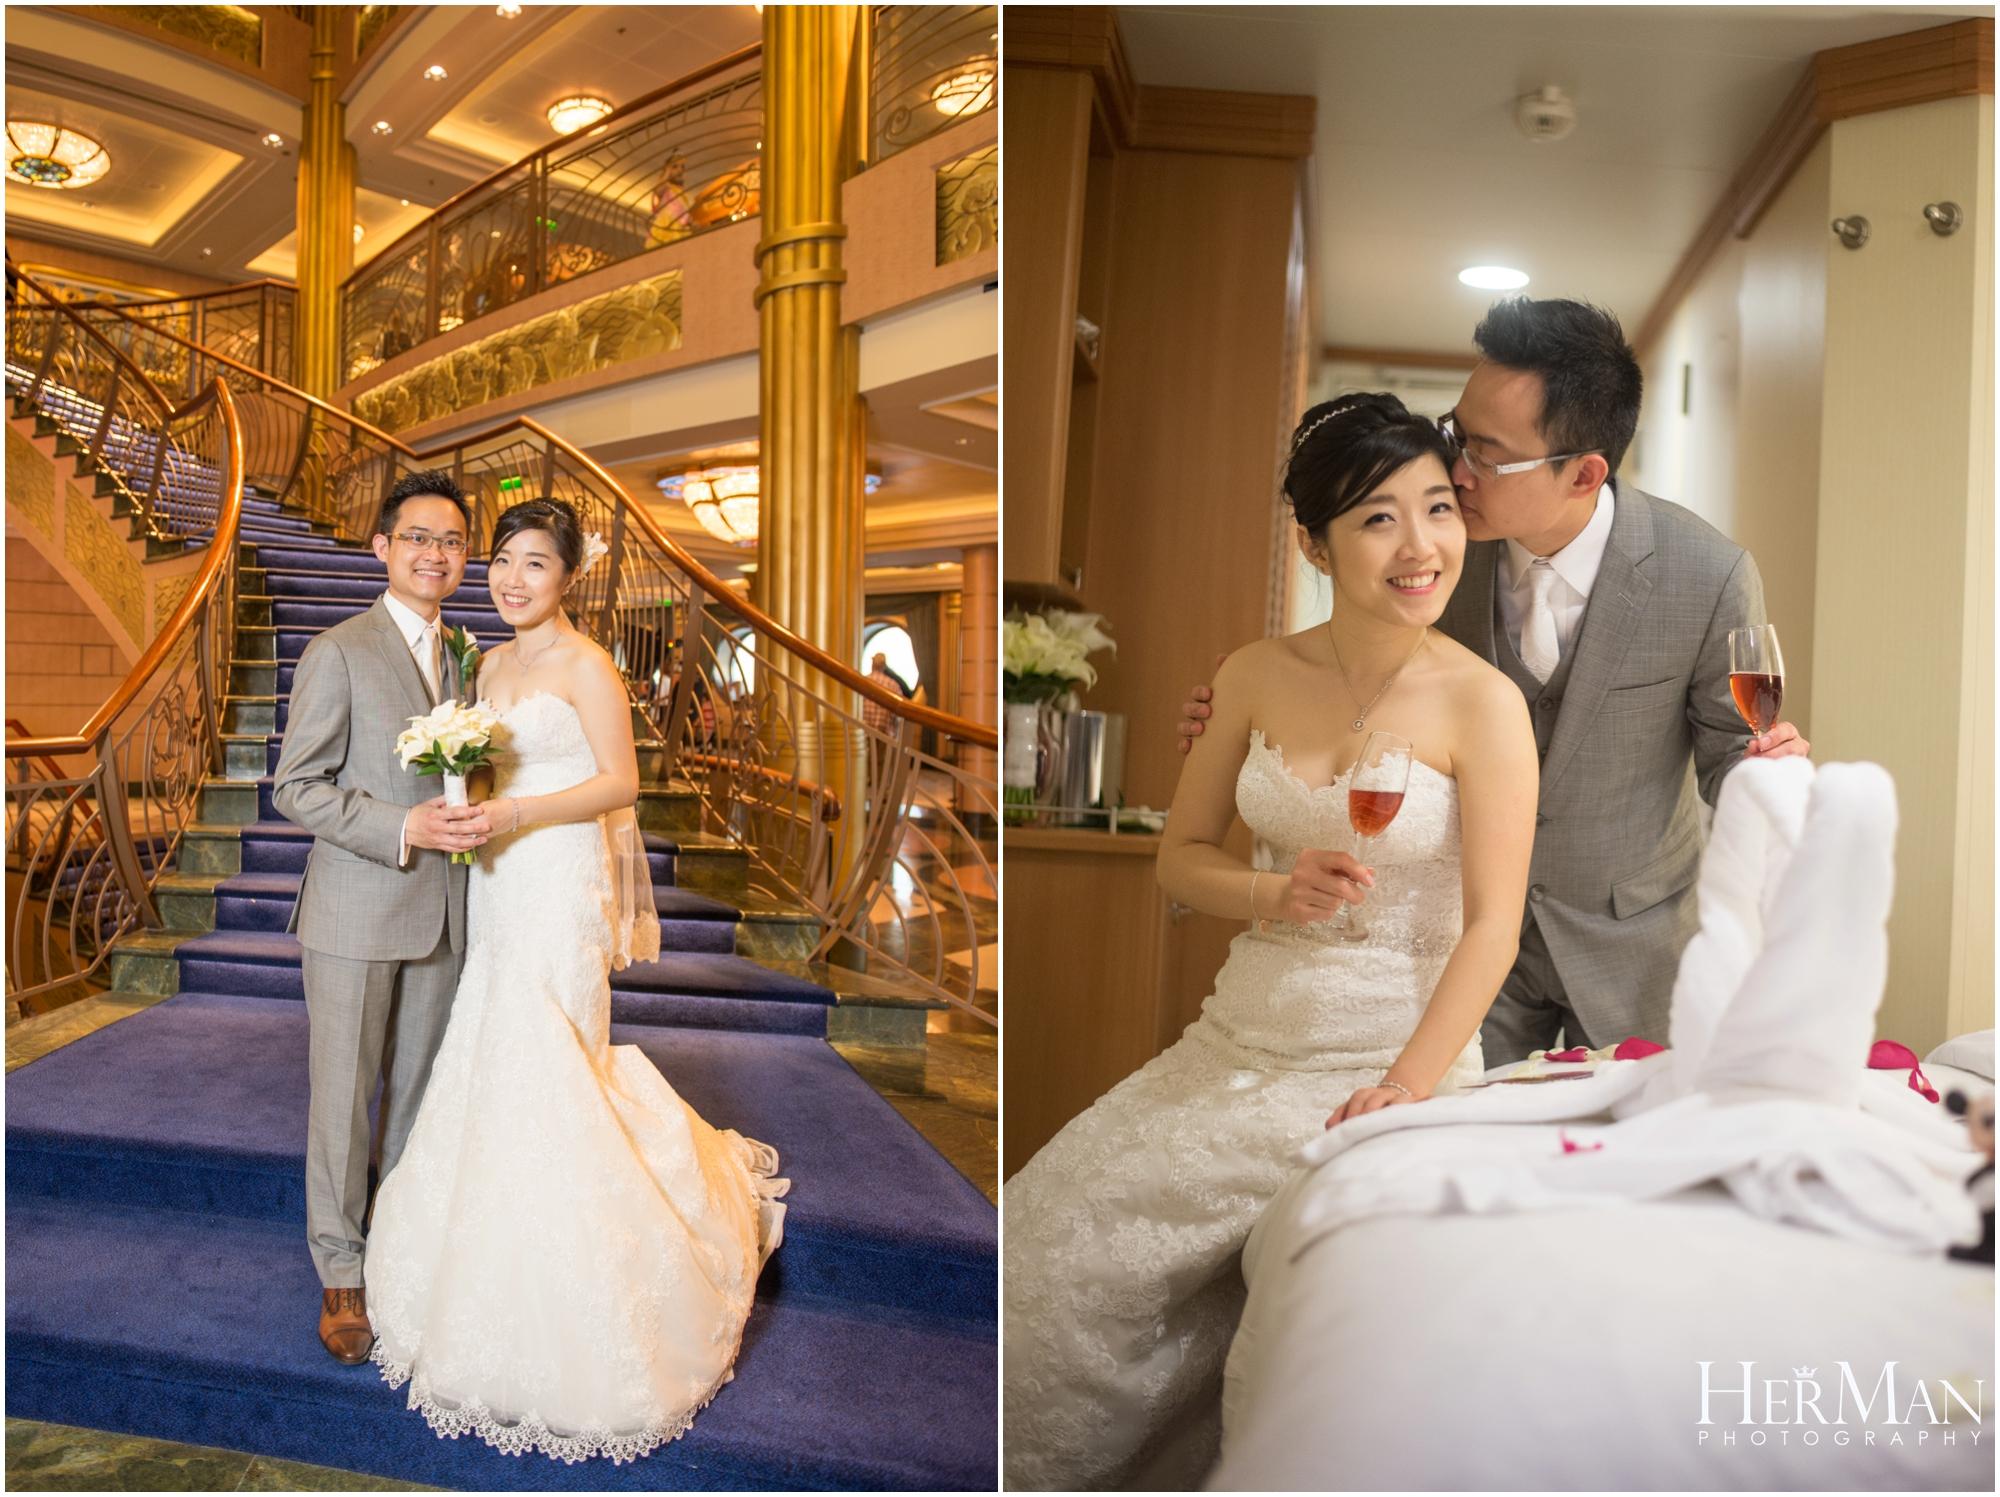 disney-fantasy-cruise-wedding-HerMan-photography_0035.jpg